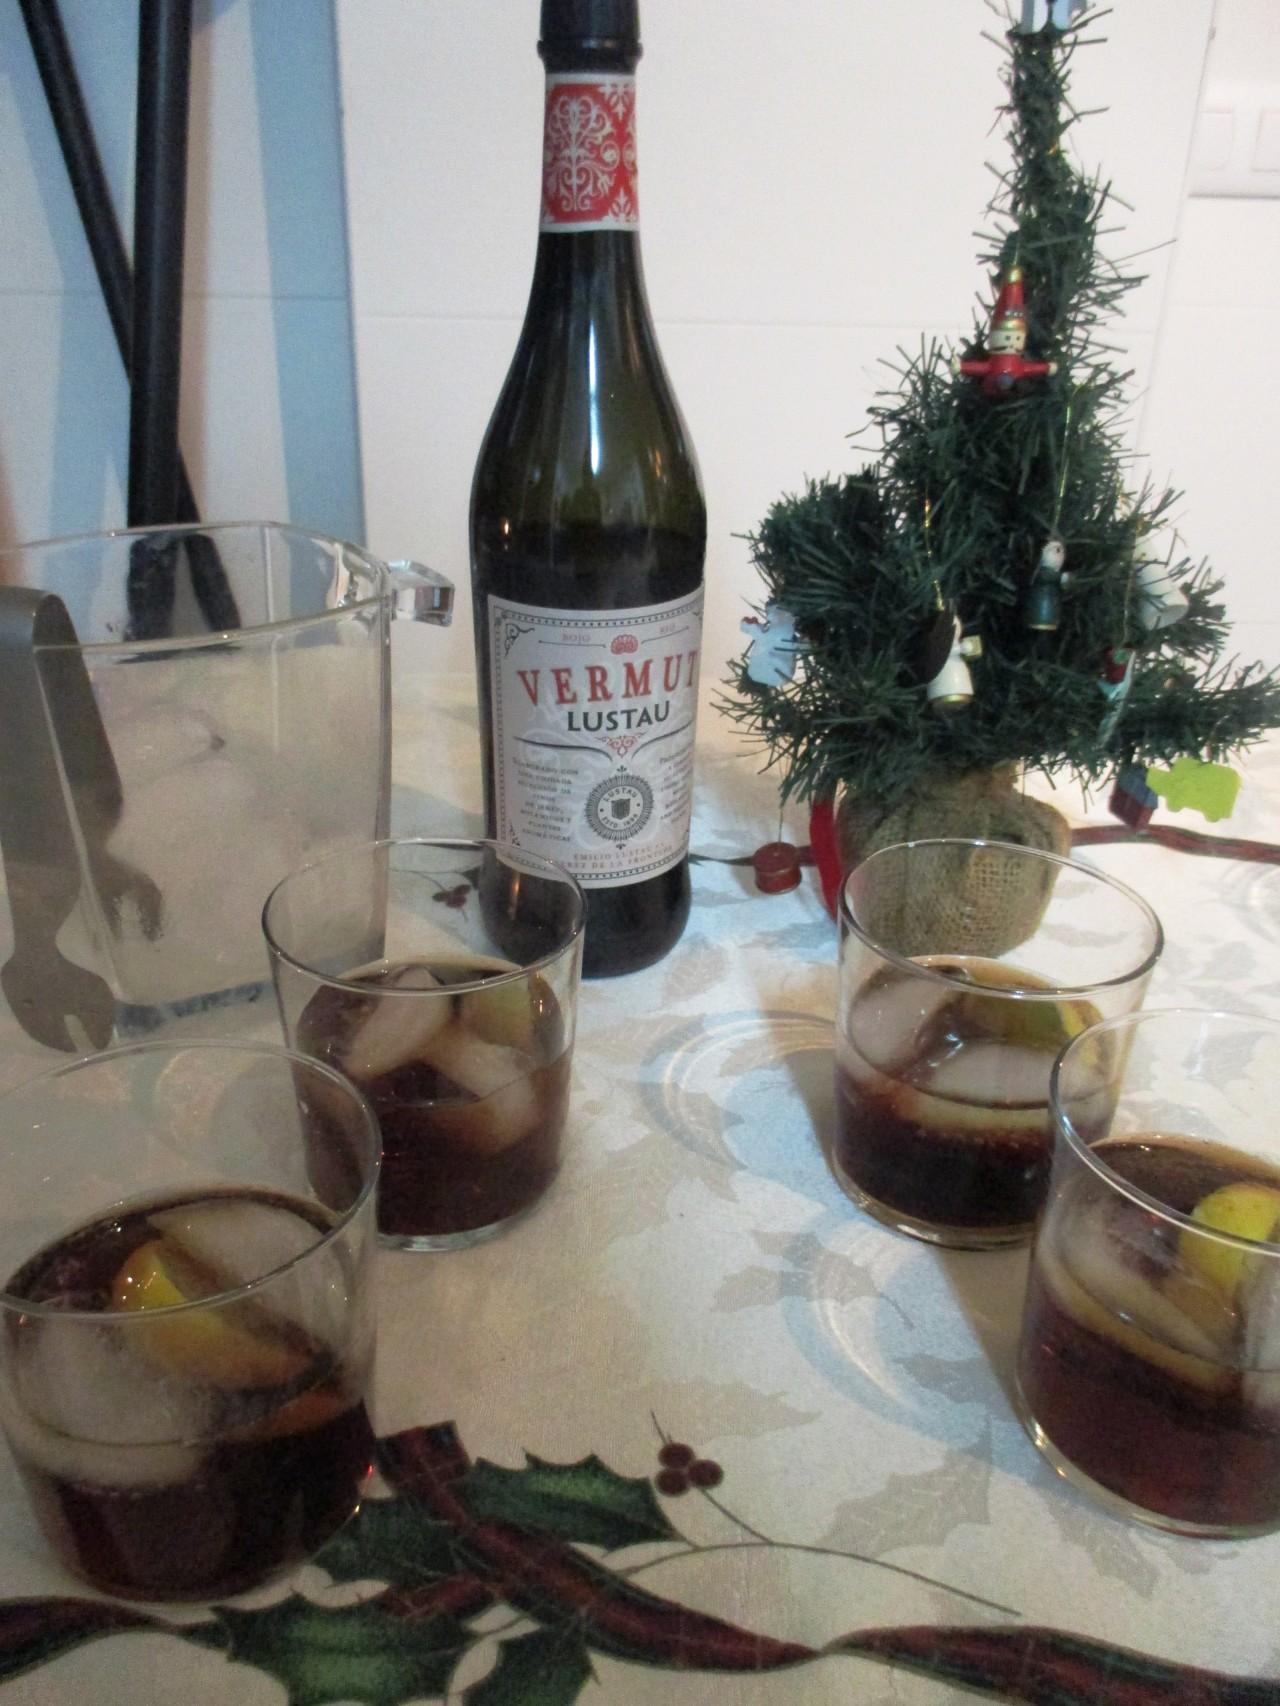 Discover Sherry recommends: Vermut de Jerez (Sherry Vermouth) de BodegasLustau